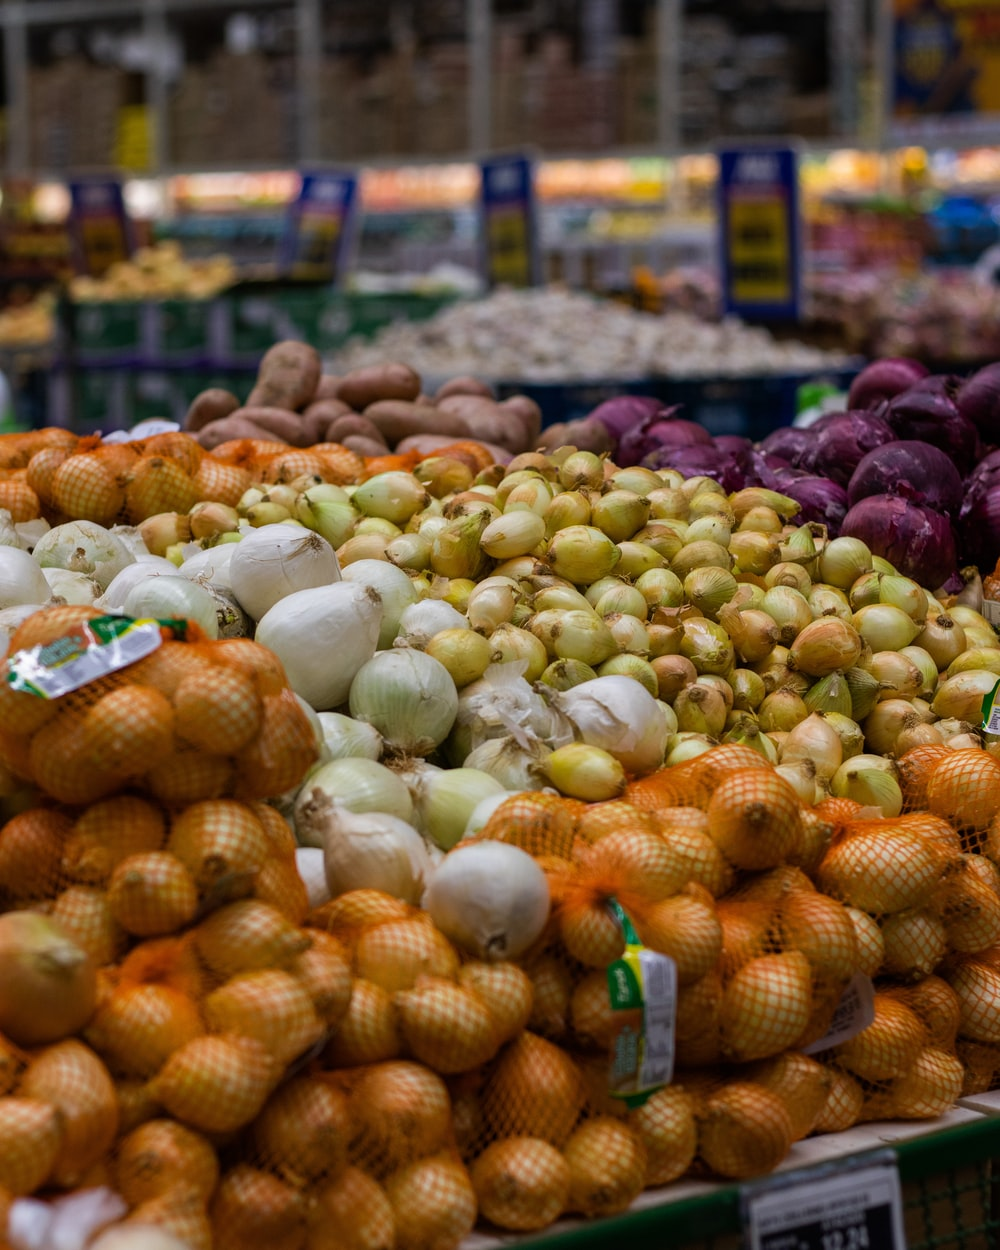 white garlic on brown woven basket